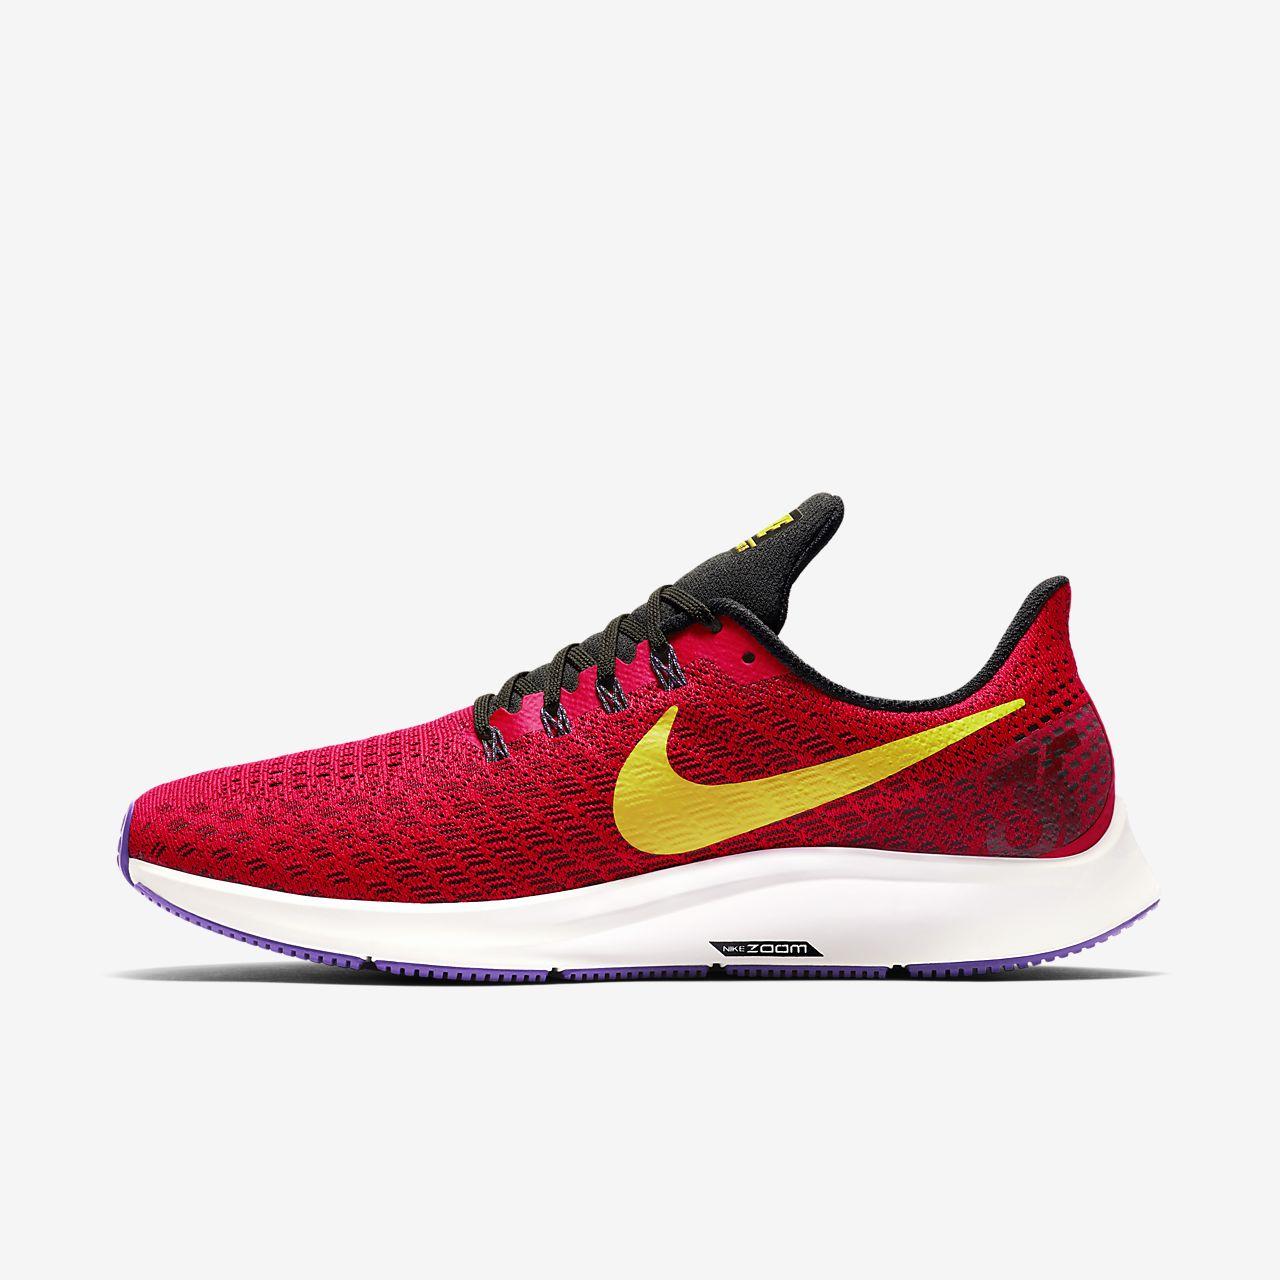 Neue Stil Schuhe Herren NIKE Air Zoom Pegasus 33 Laufschuh